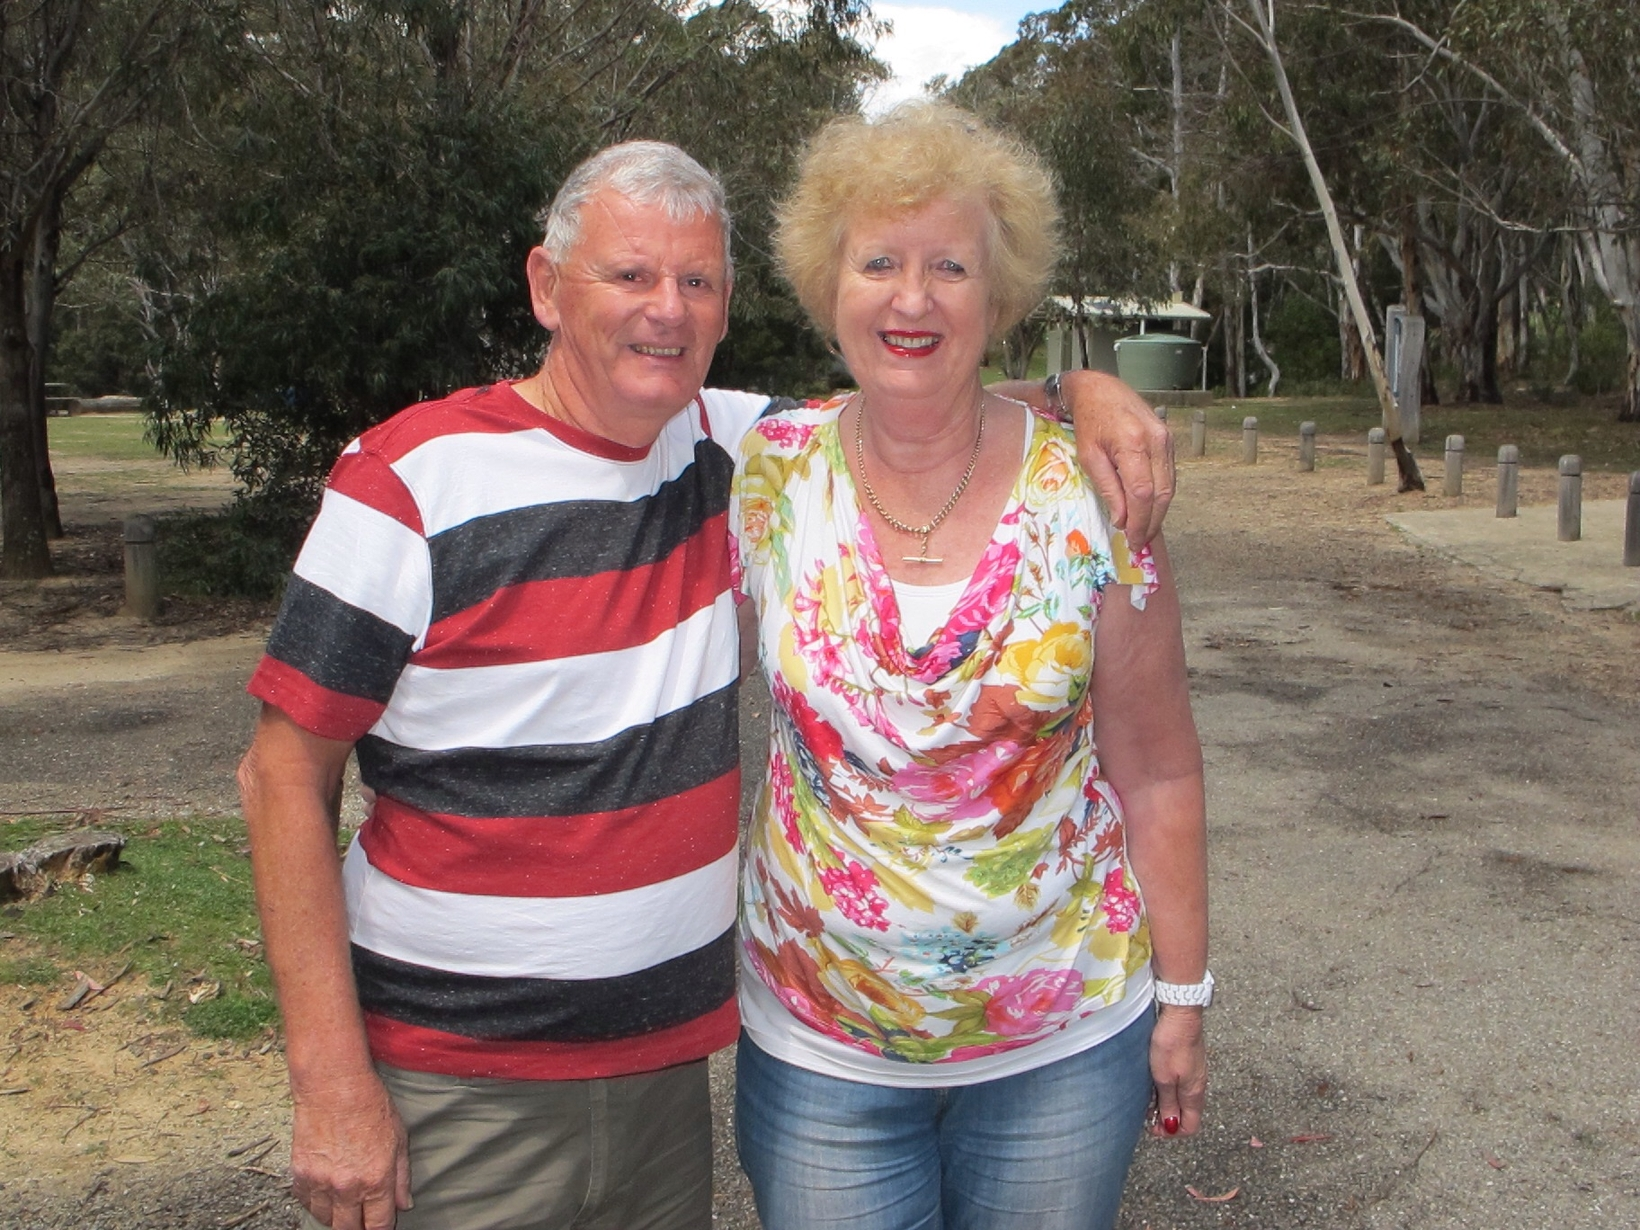 Sylvia&kevin & Kevin from Canberra, Australian Capital Territory, Australia